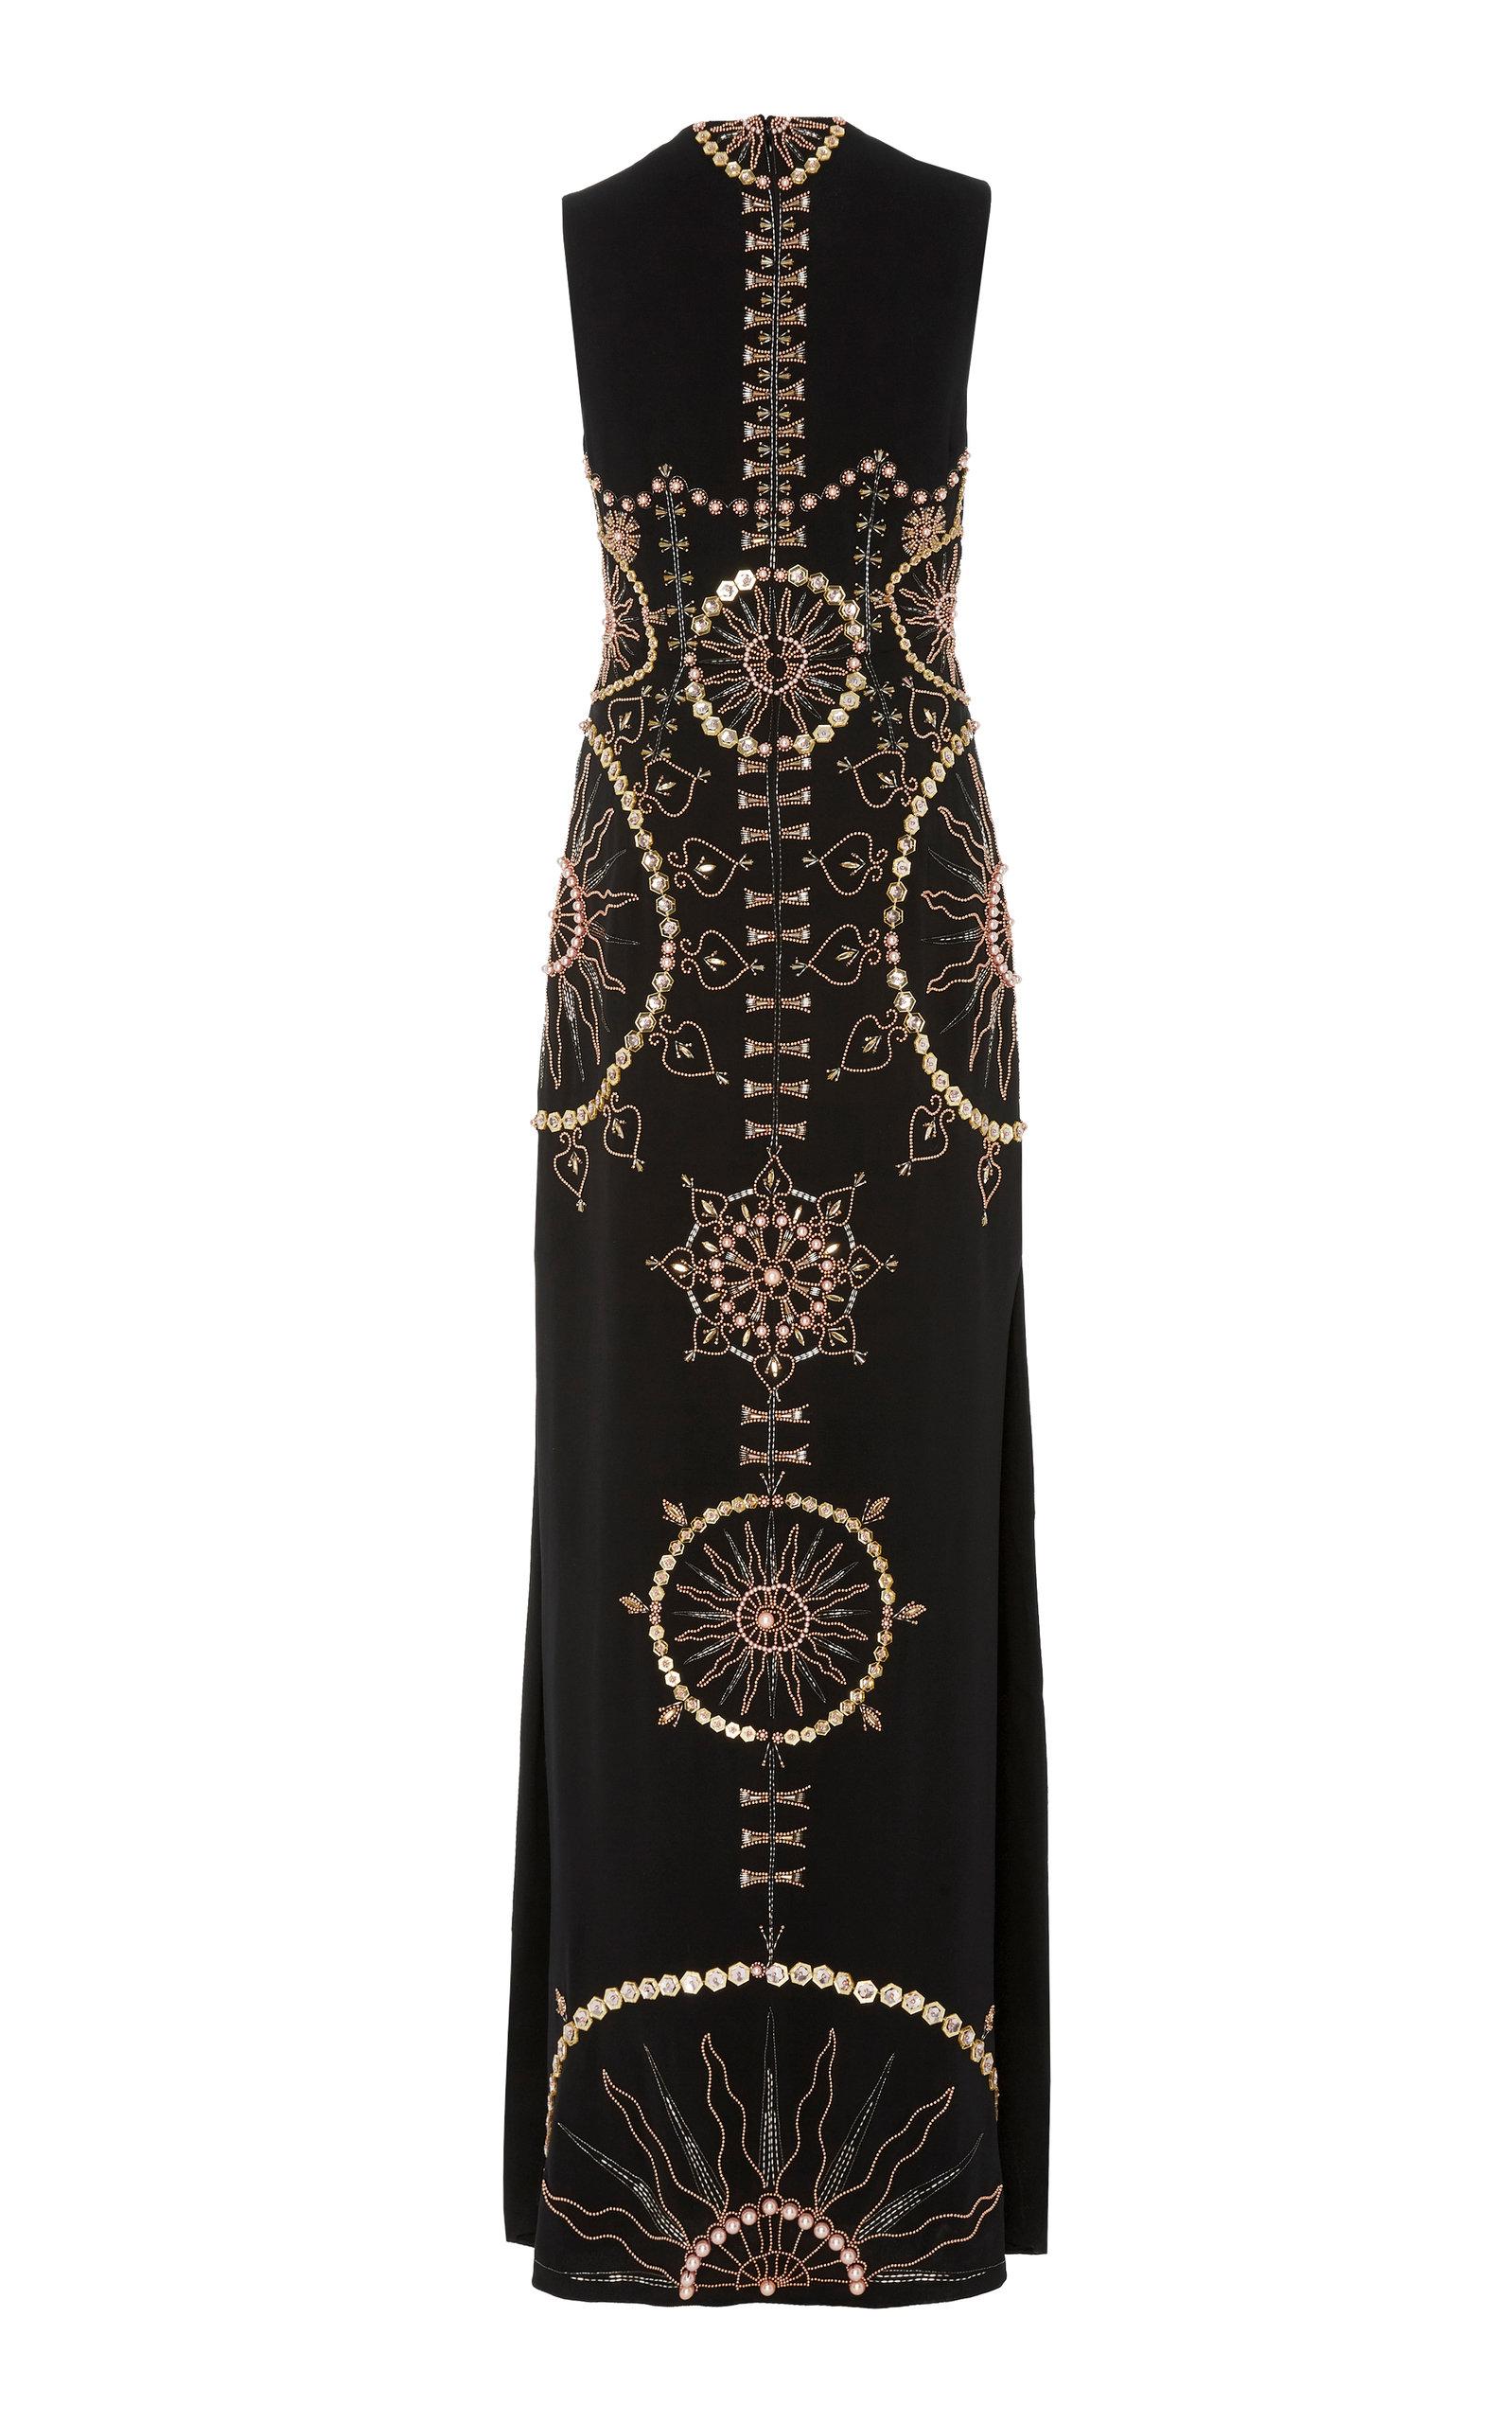 Sol Invictus Heavy Silk Georgette Dress Cucculelli Shaheen 2sVp5ry